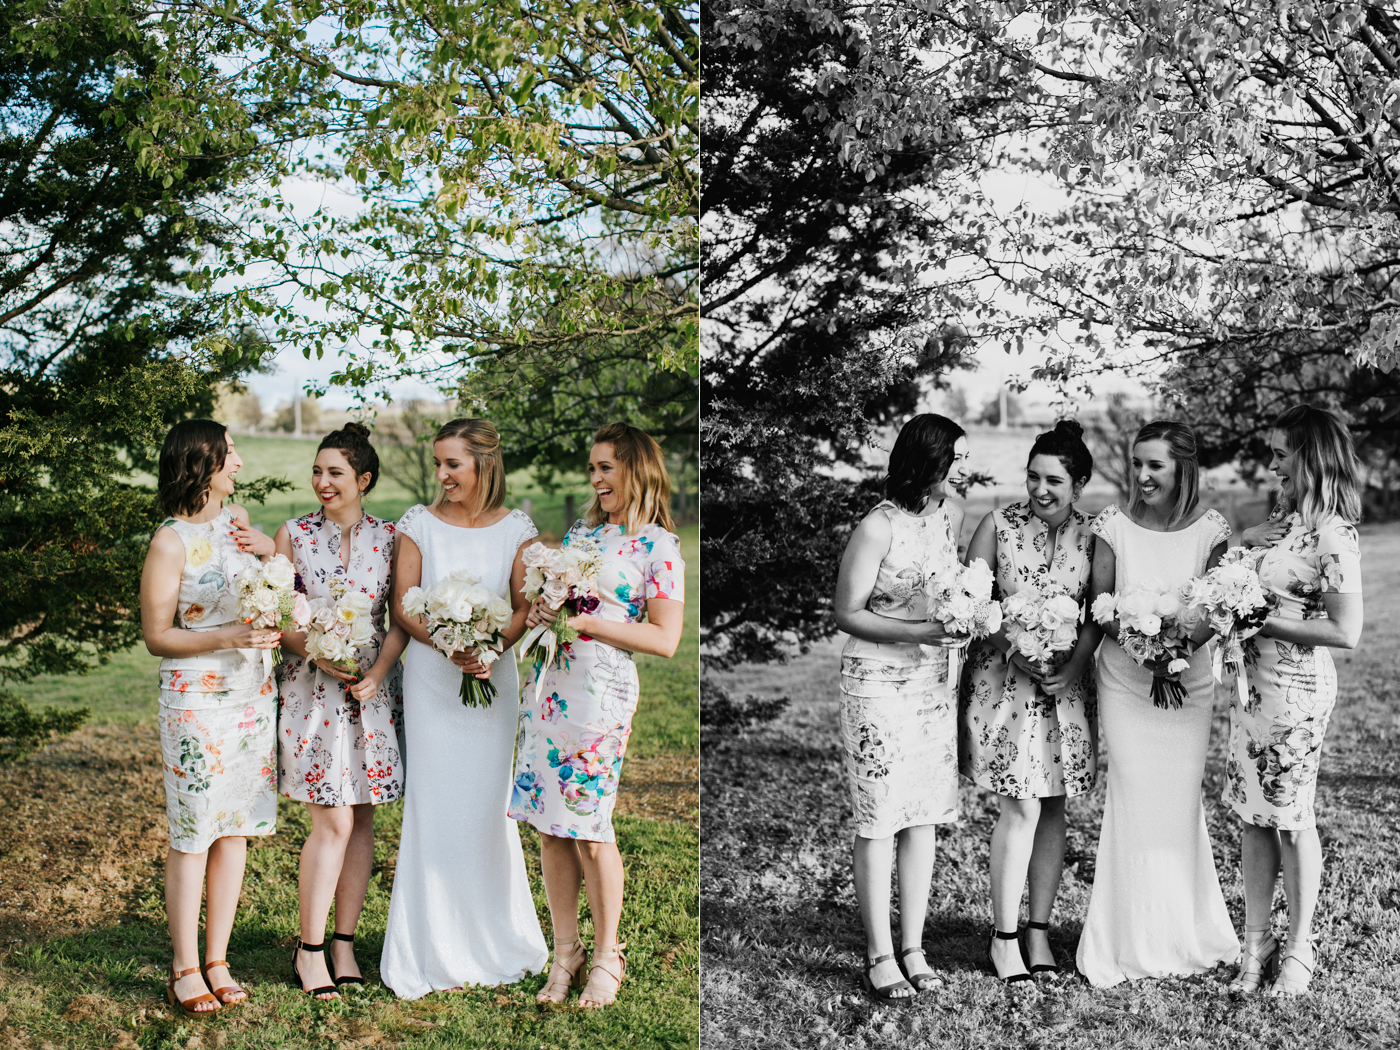 Bridget & James - Orange Country Wedding - Samantha Heather Photography-107.jpg